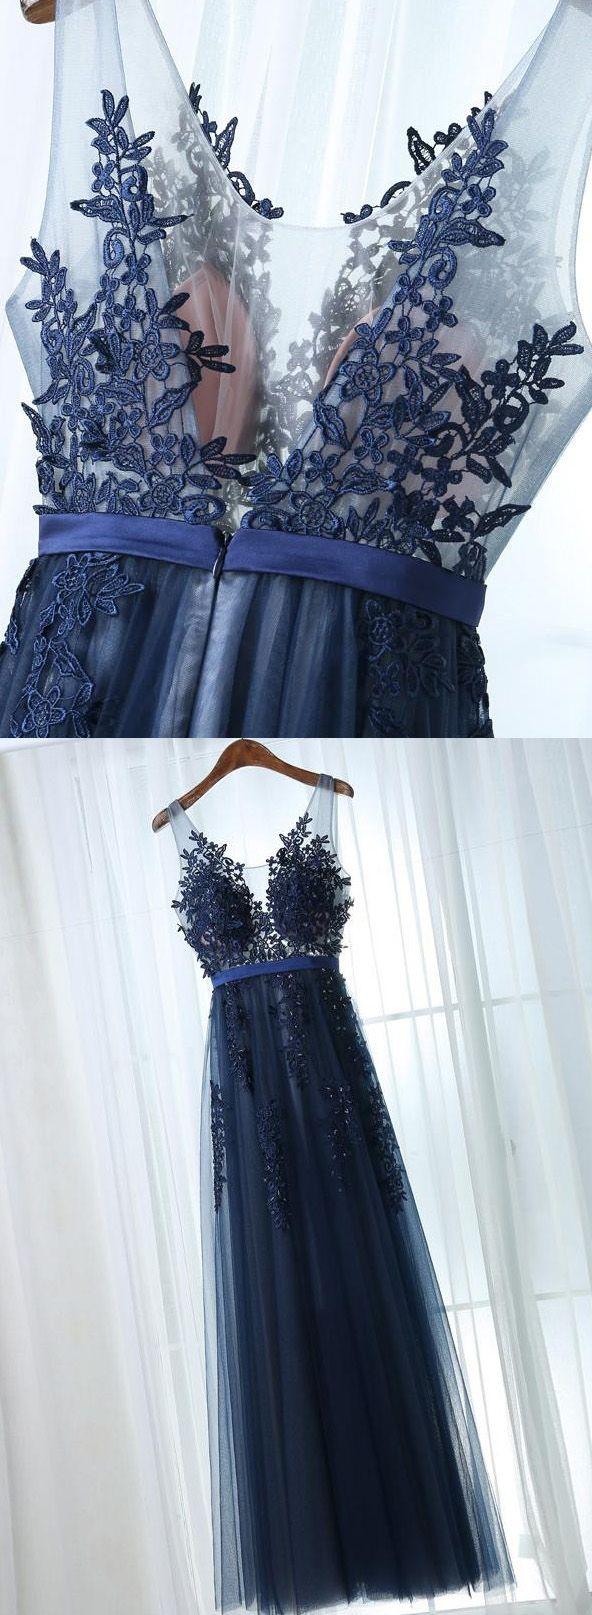 Sleeveless navy prom evening dresses comely long alineprincess